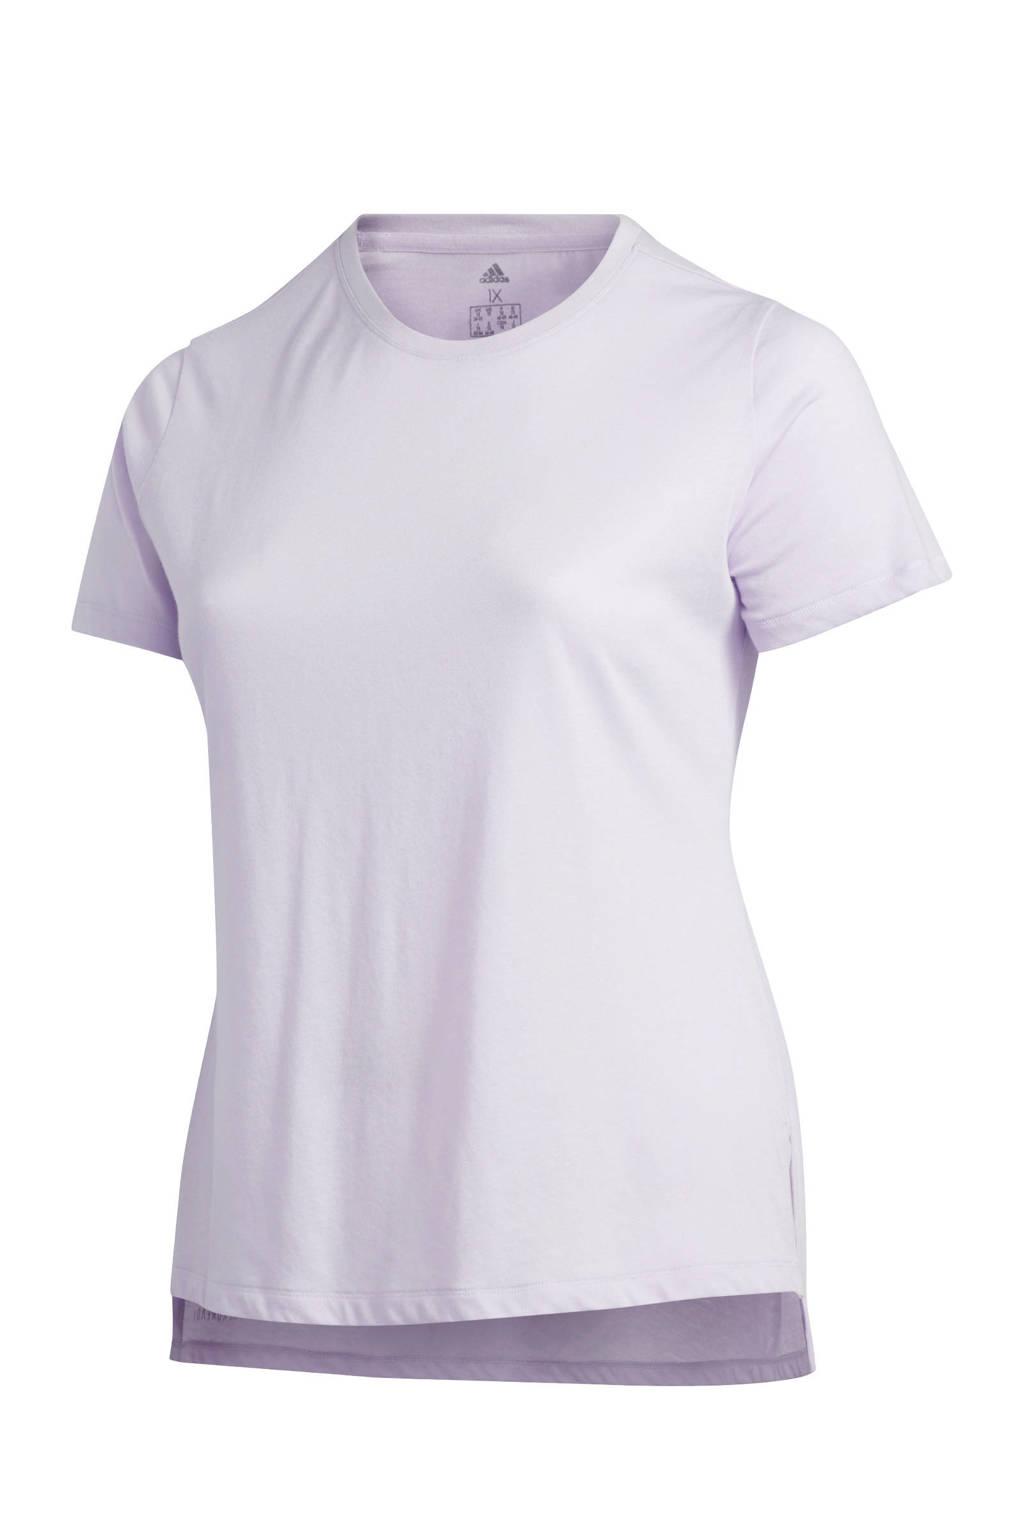 adidas performance Plus Size sport T-shirt lila, Lila